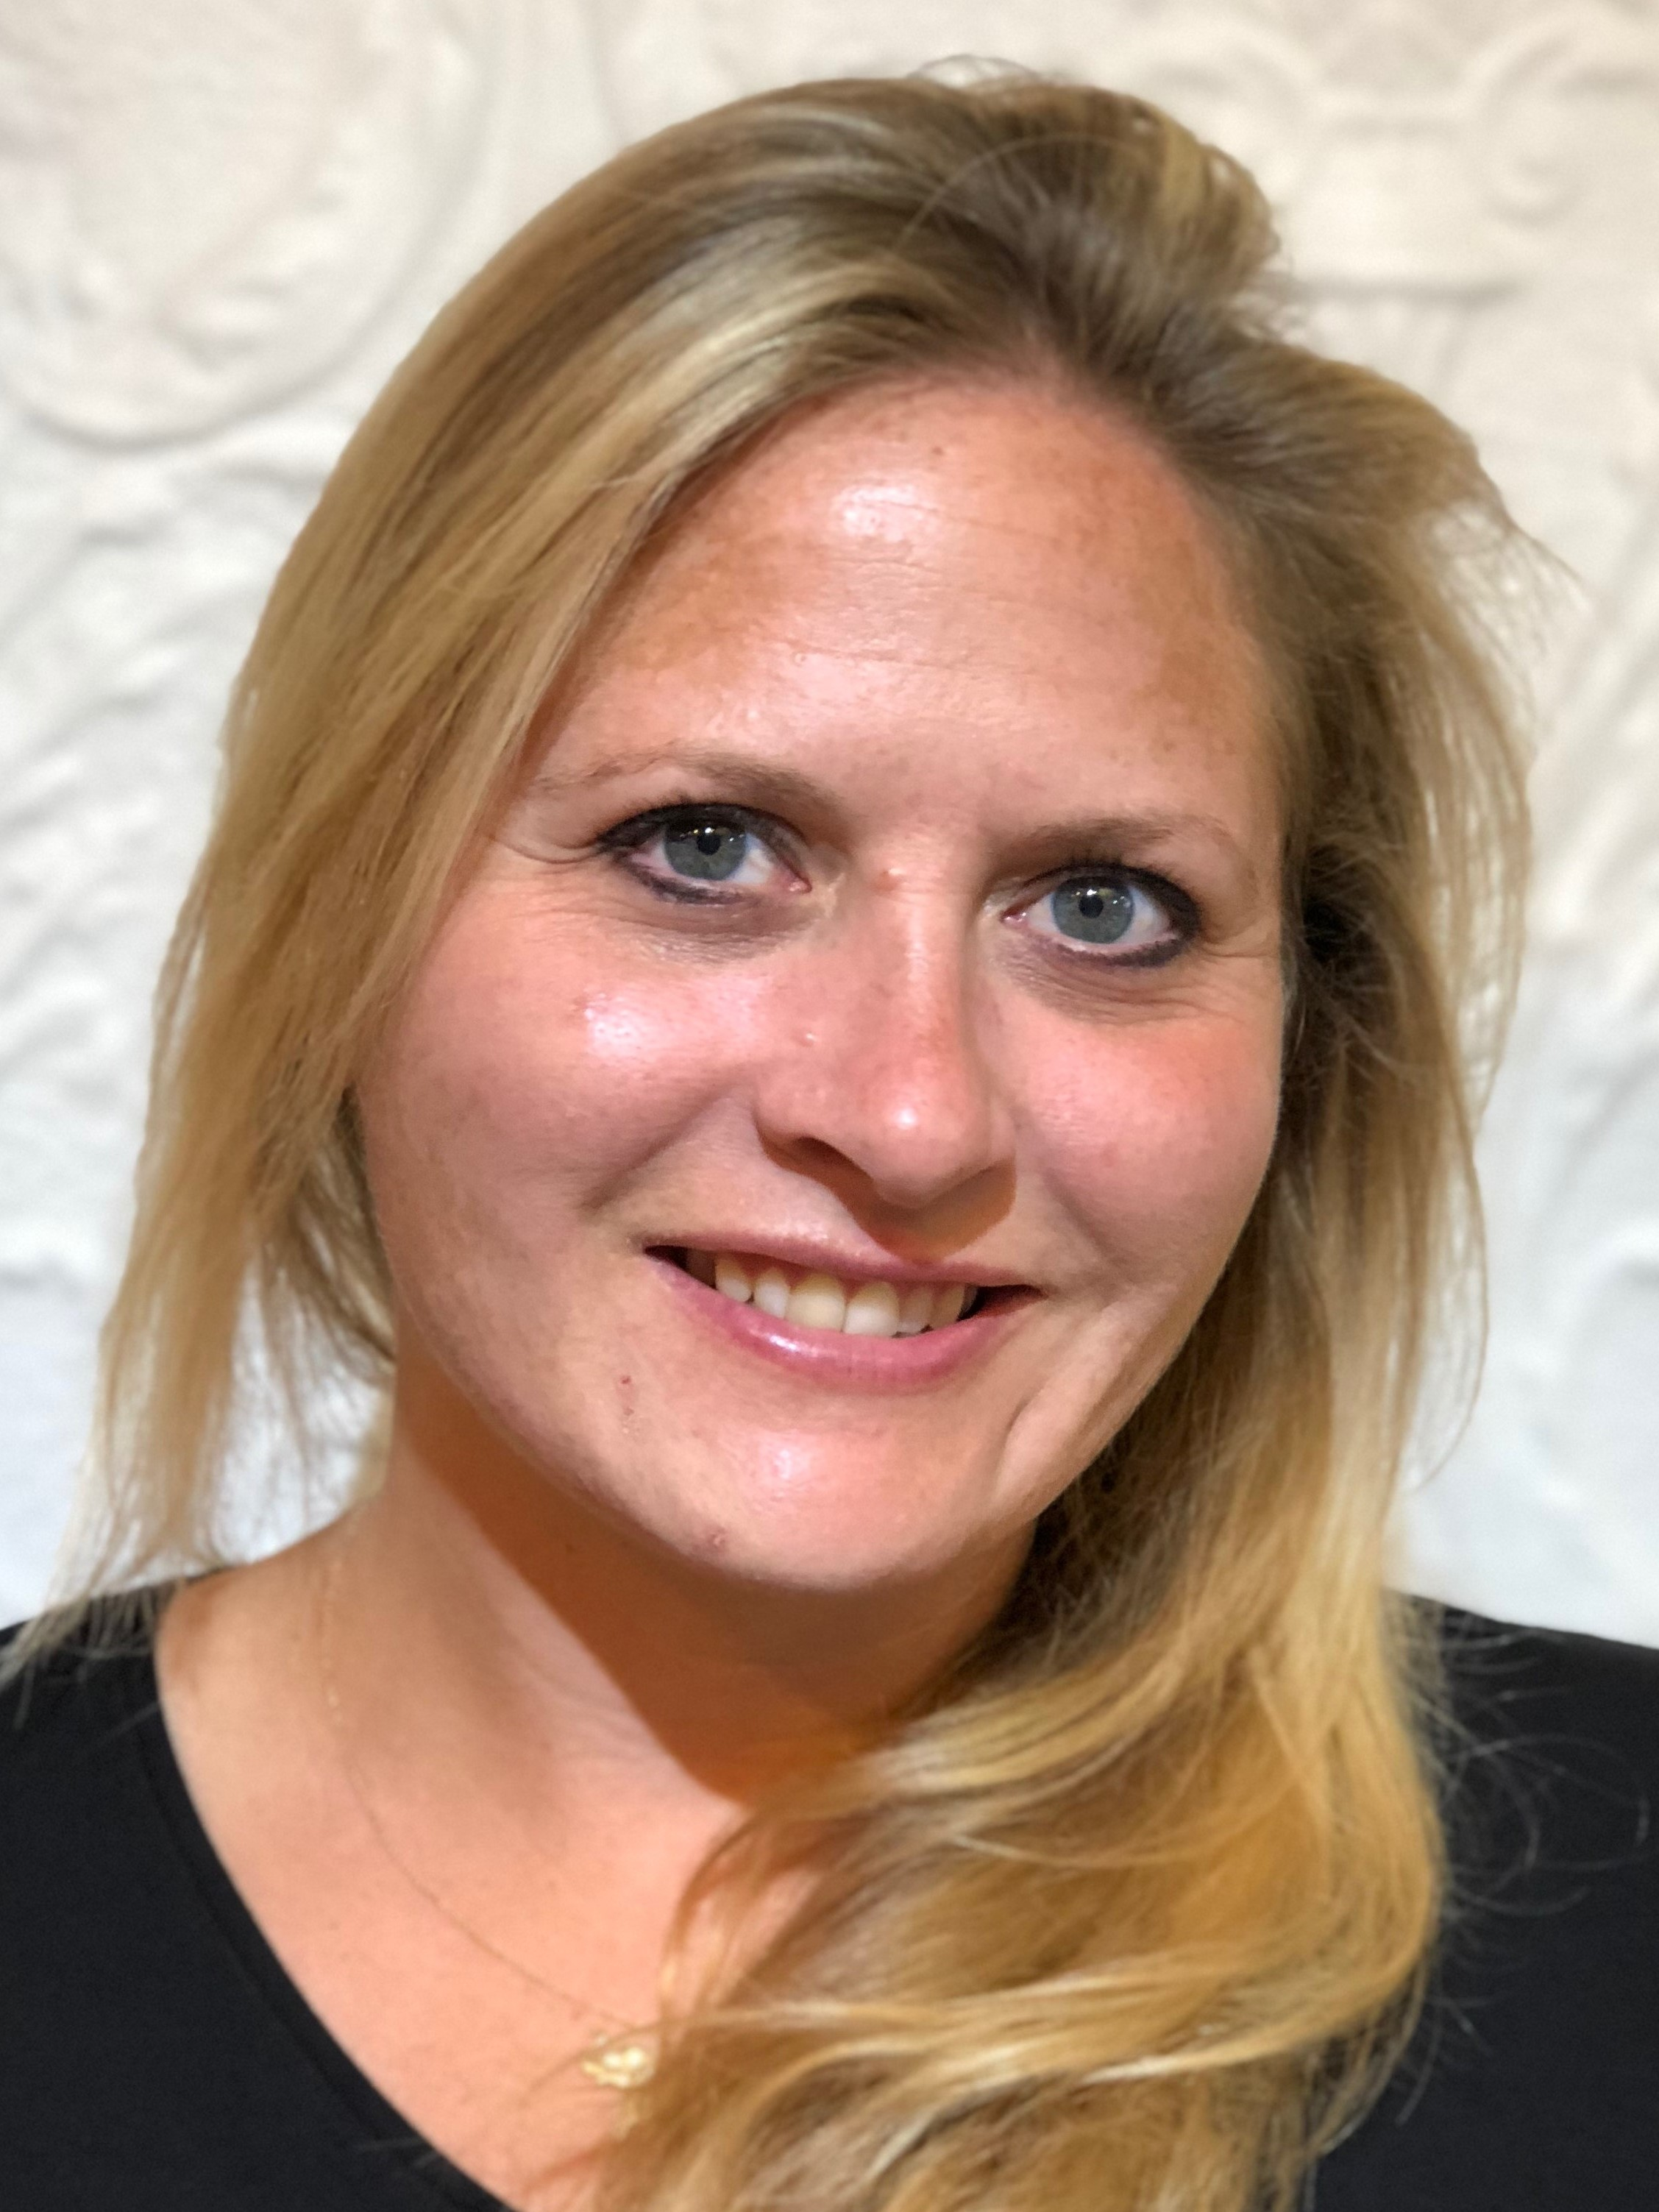 Maribeth Nitschke Phibbs